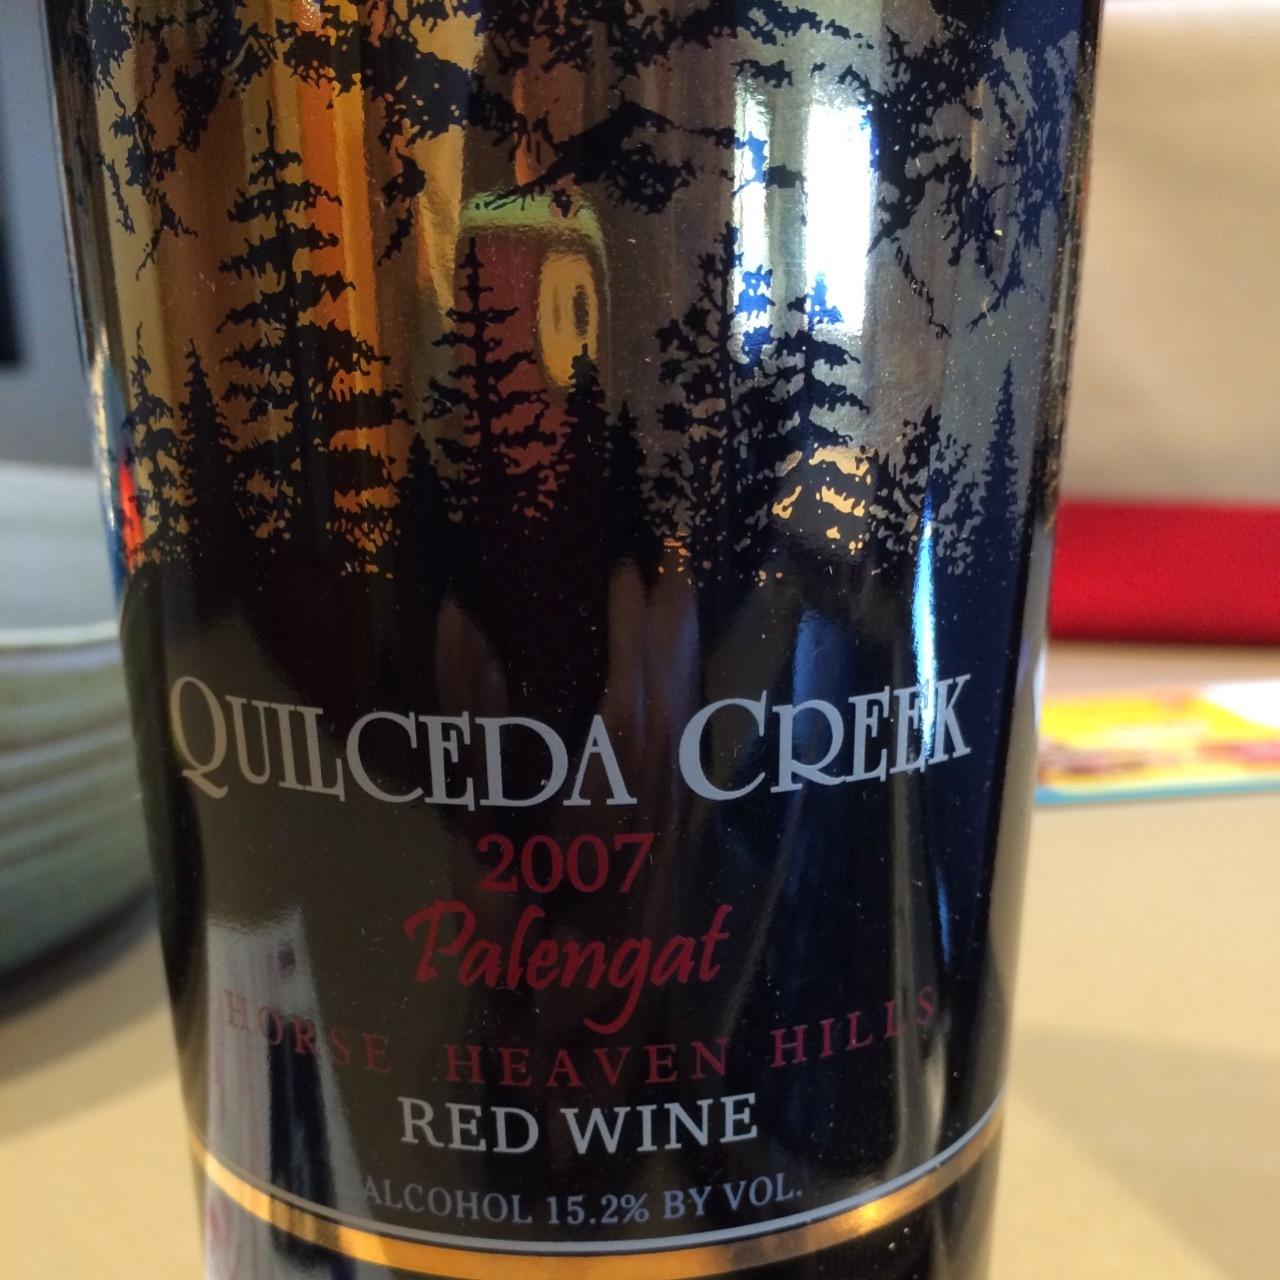 Quilceda Creek Palengat Vineyard Cabernet Sauvignon 2007 Cellaraiders